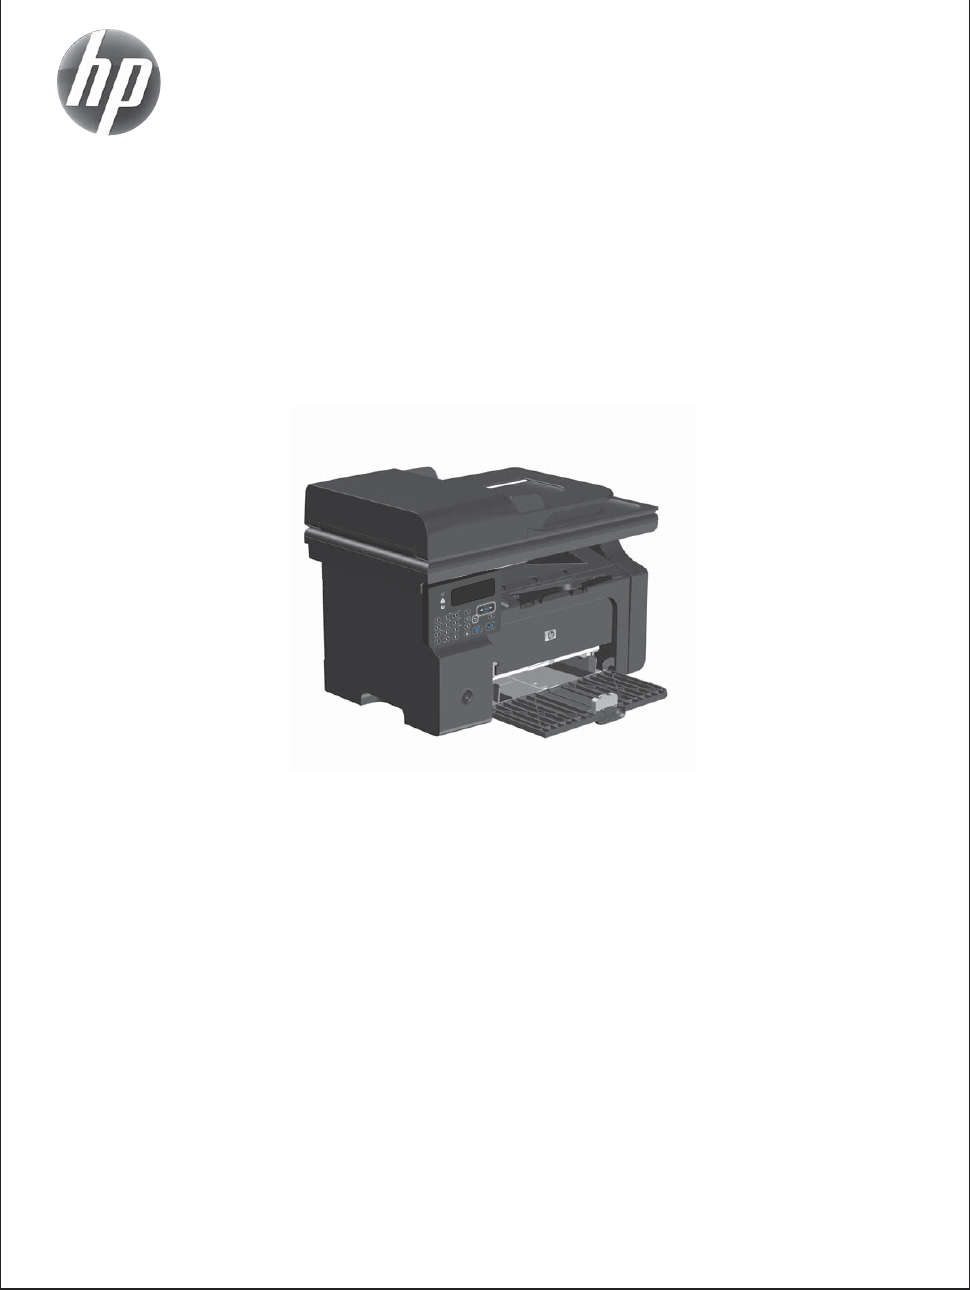 Hp Laserjet P1102 Service Manual : laserjet, p1102, service, manual, Laserjet, Printer, Manual, Econoplus